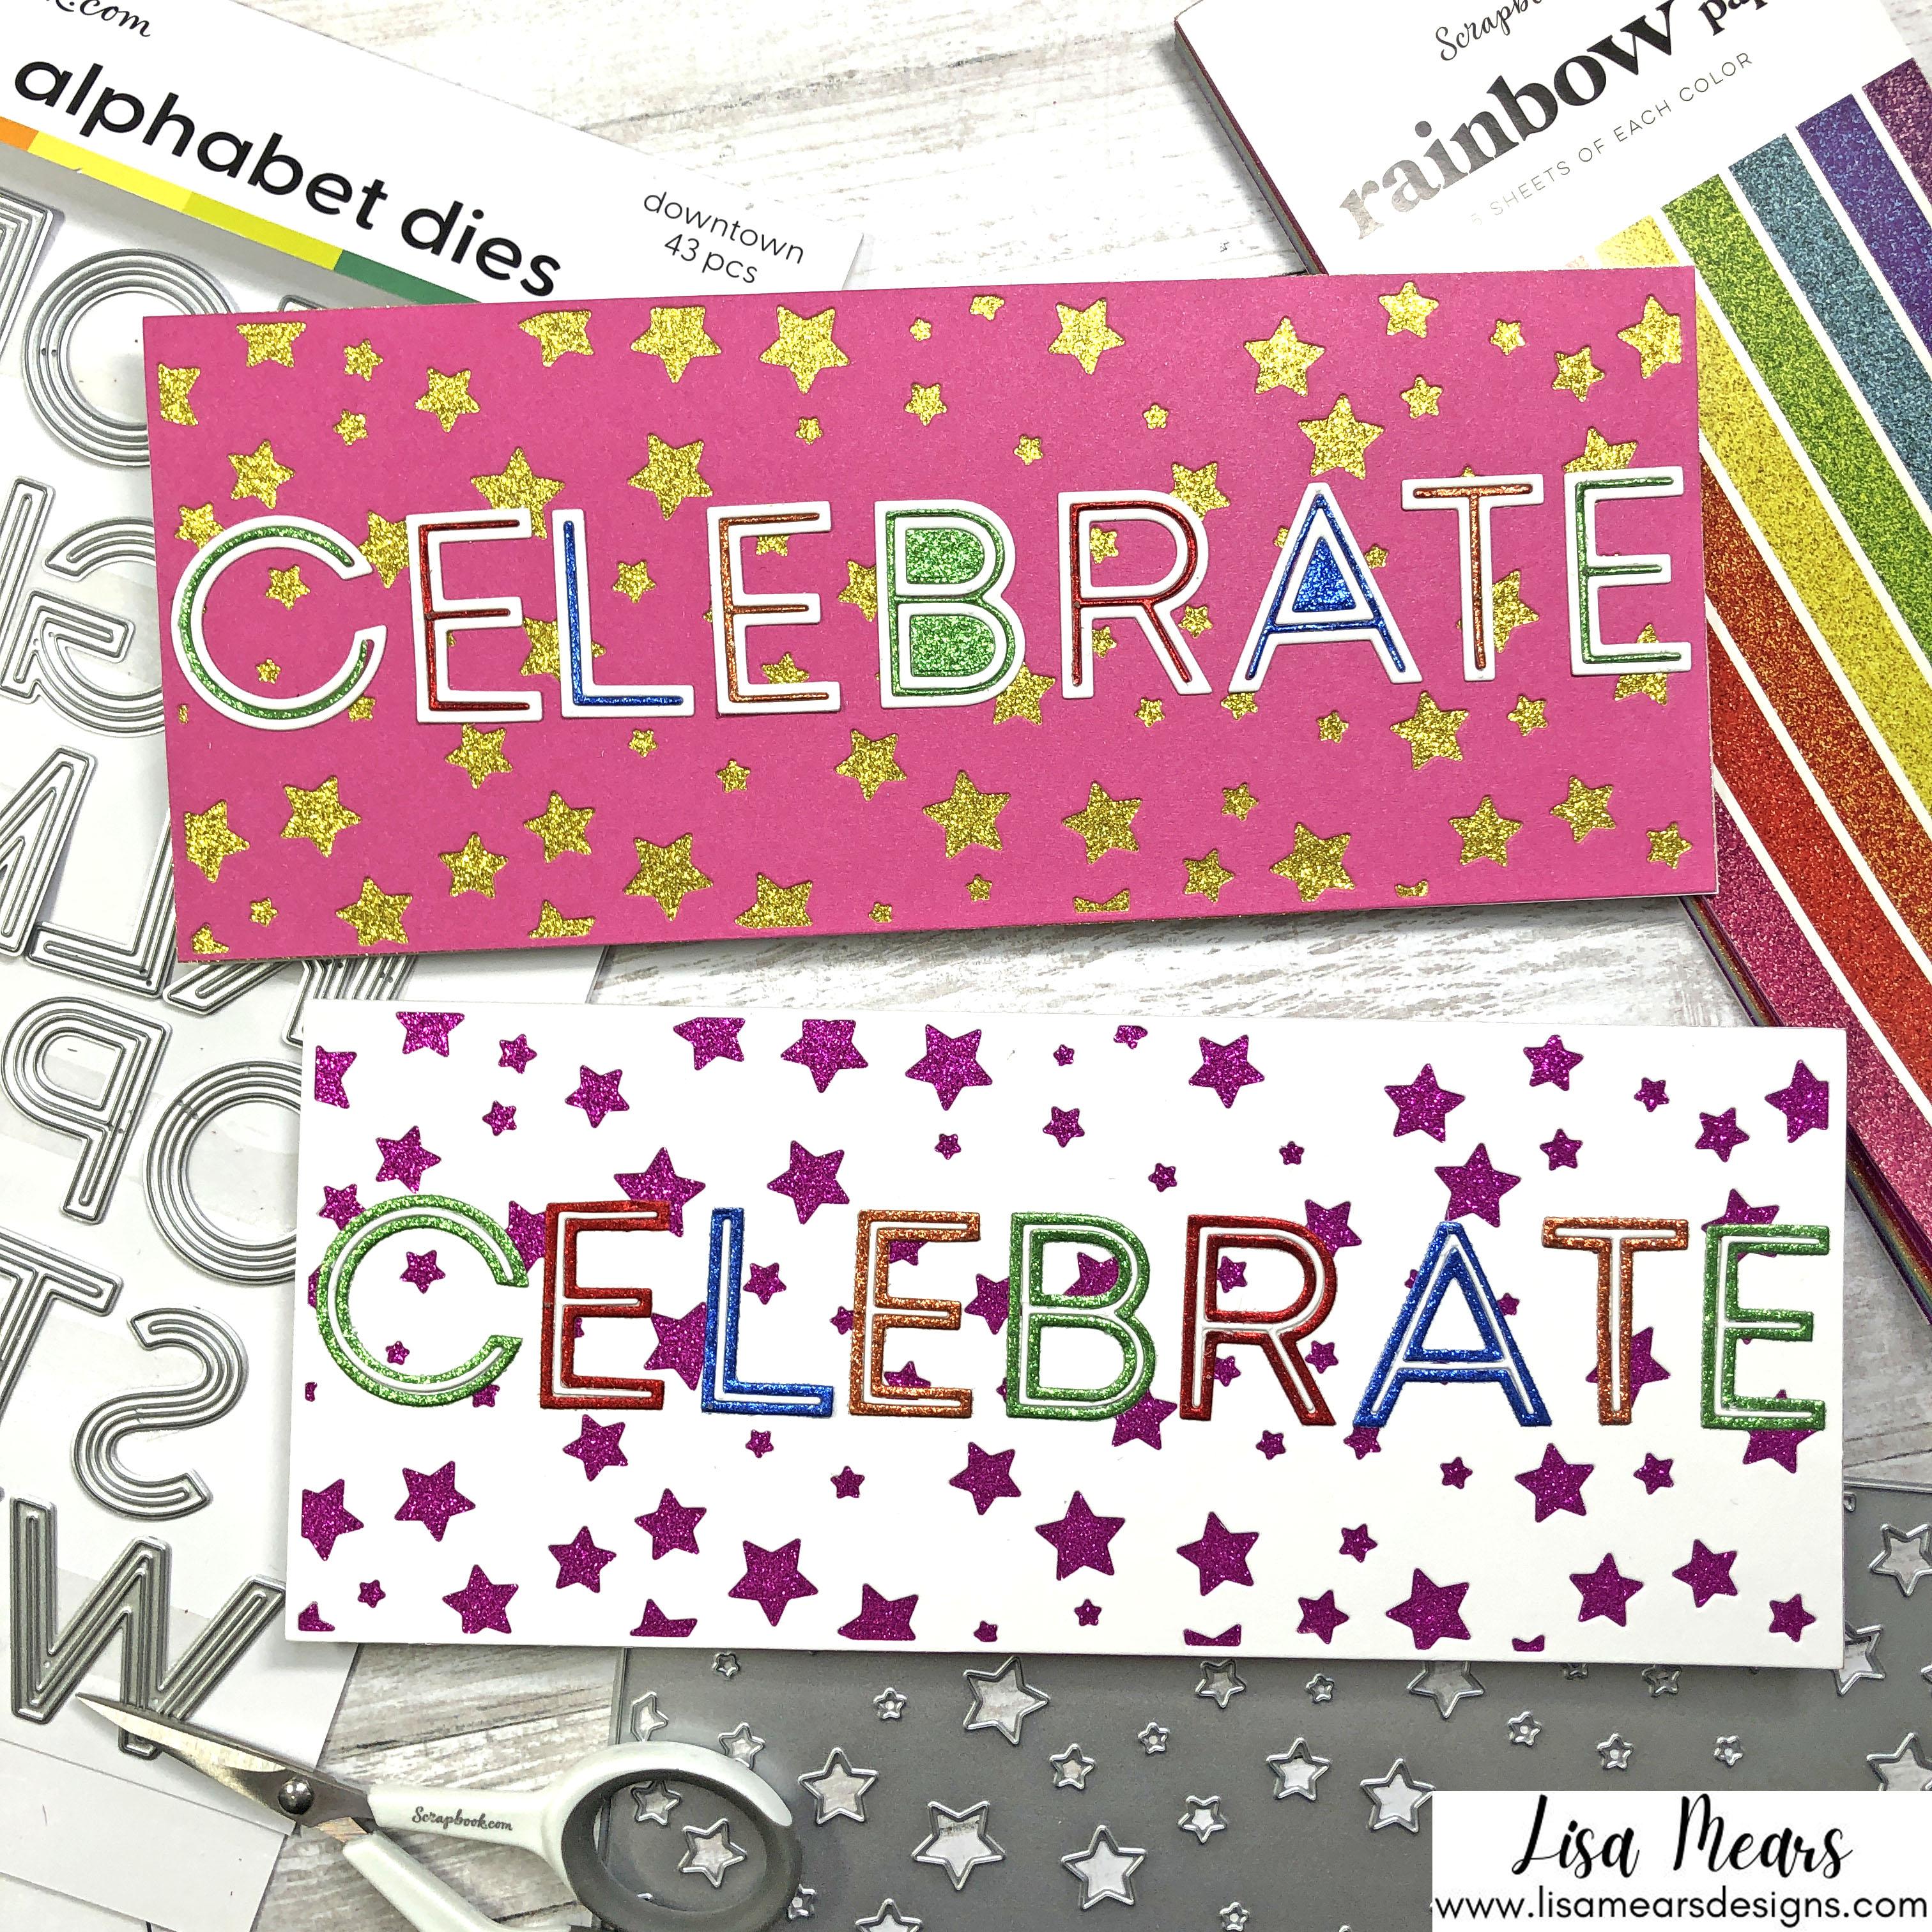 Using Glitter Cardstock - Scrapbook.com Rainbow Glitter Cardstock, Downtown Alphabet Dies, and Star Slimline Die